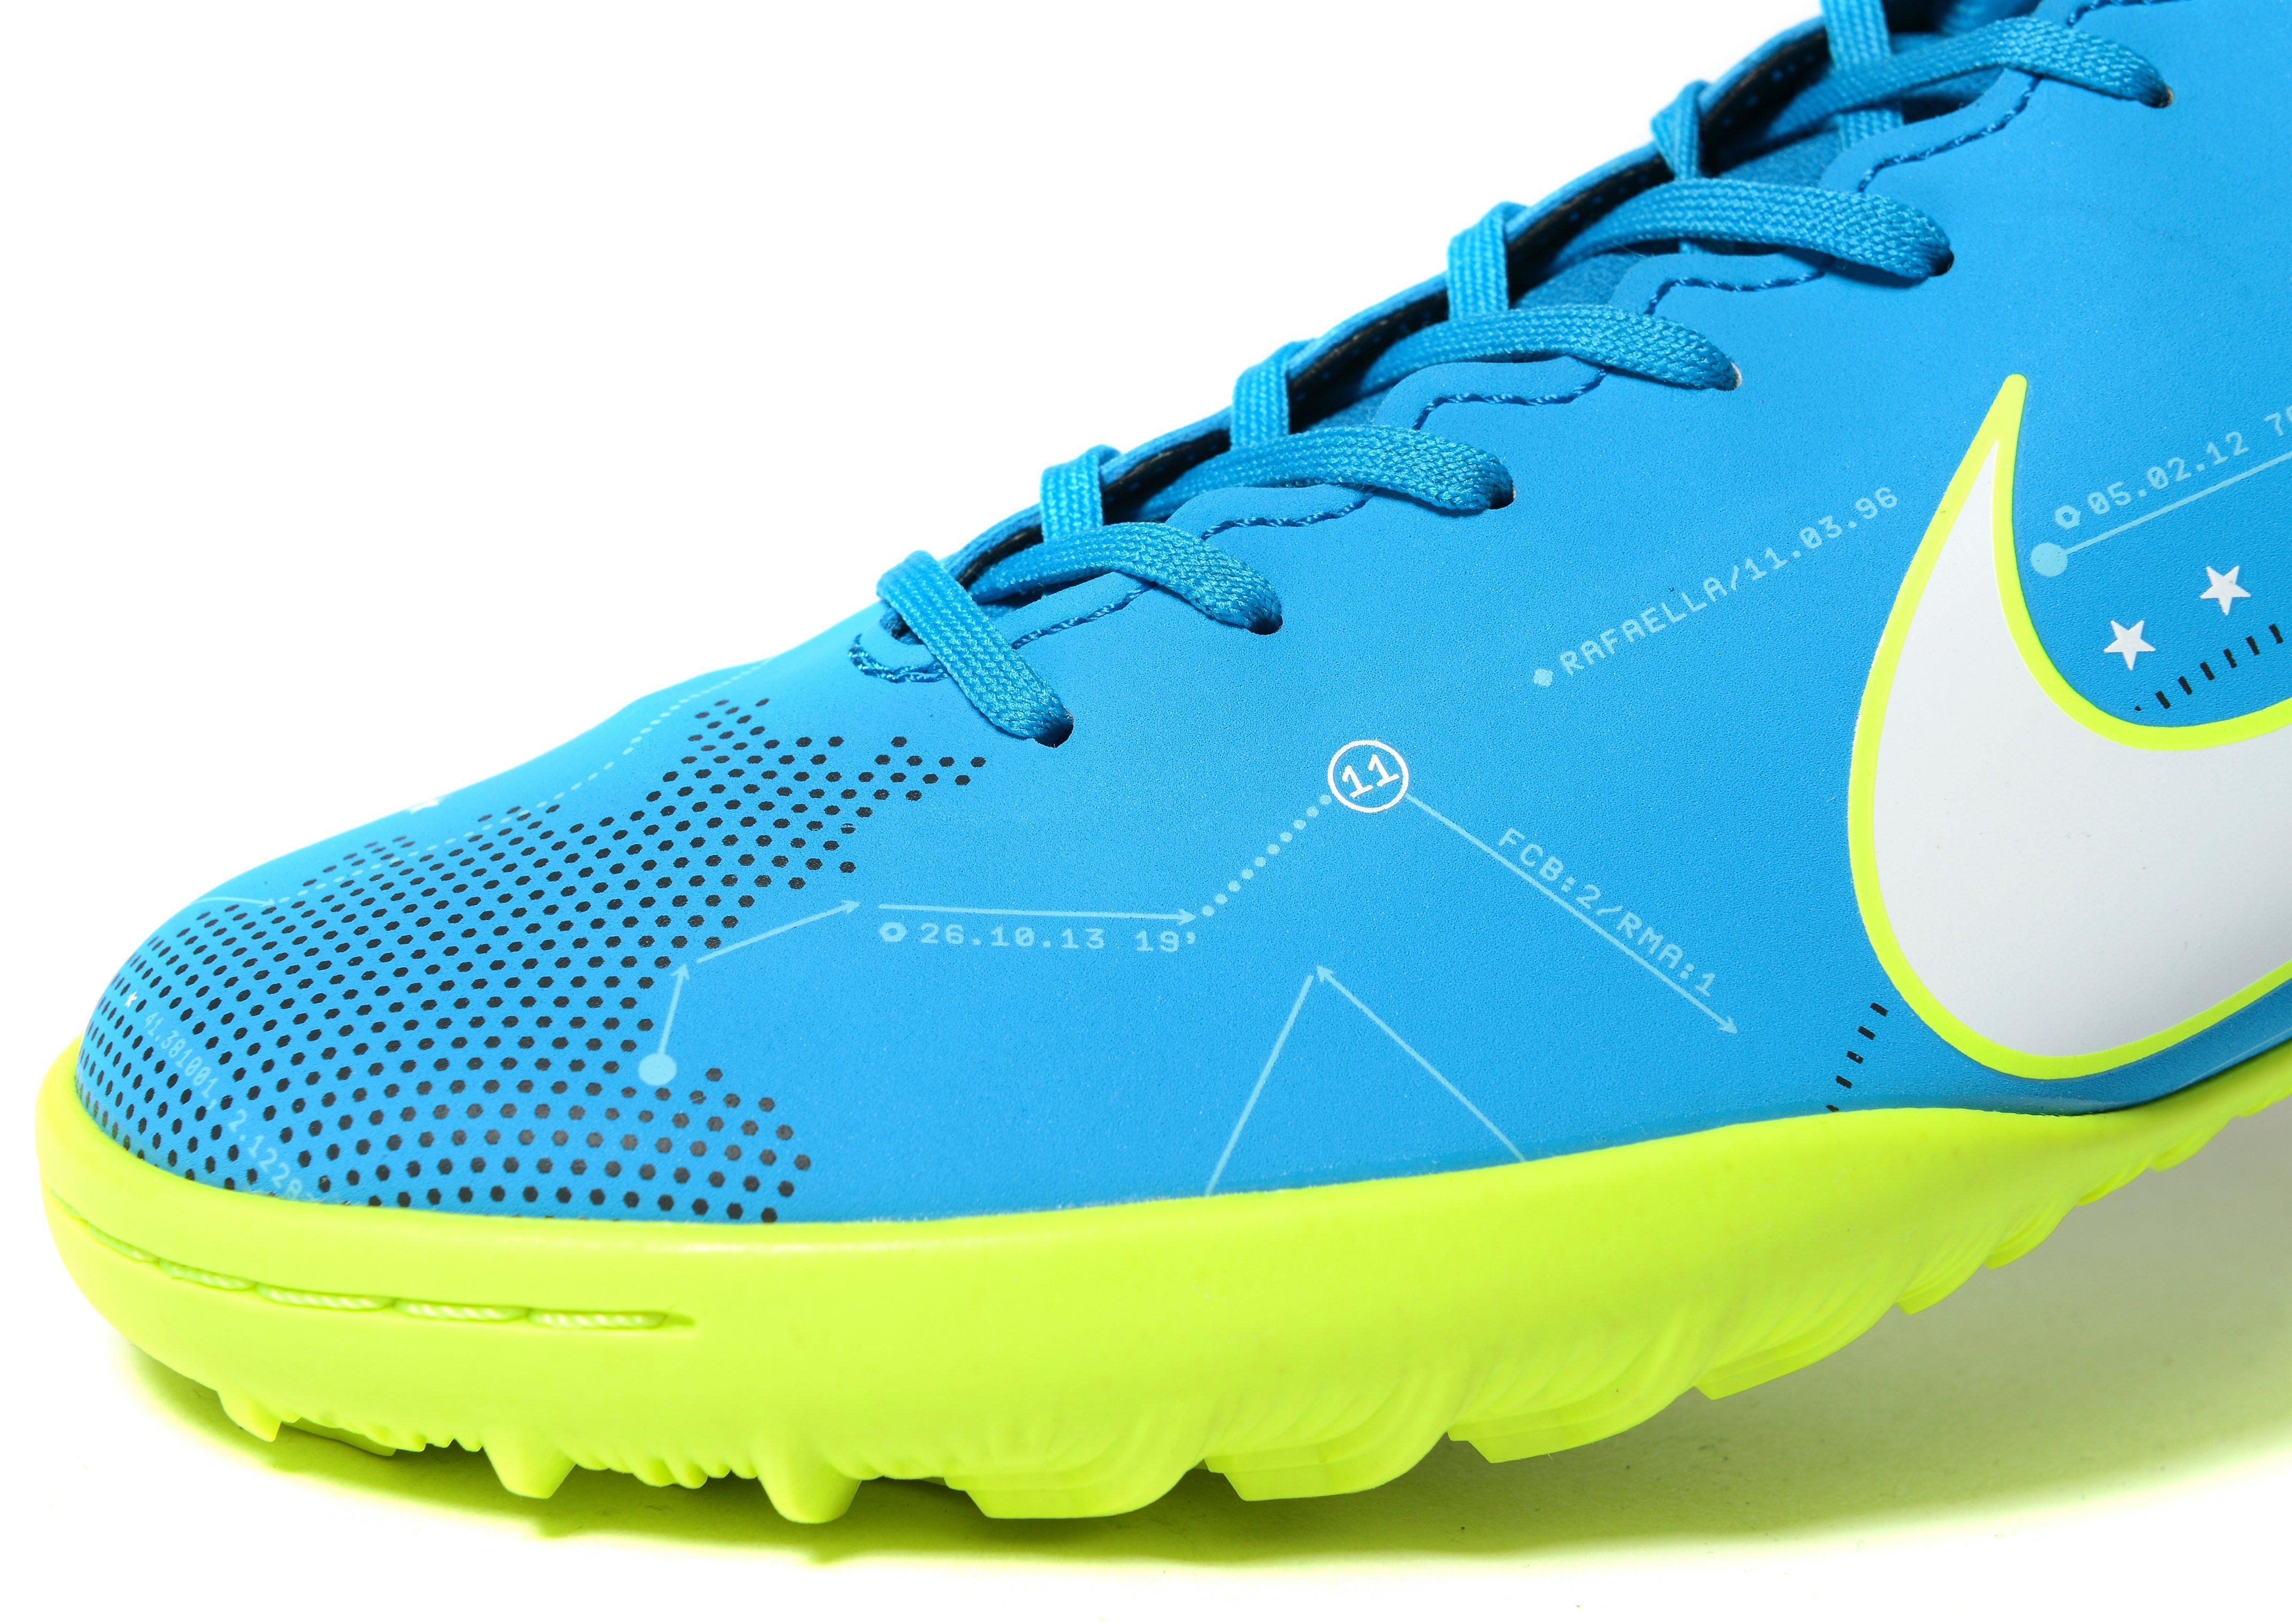 Nike Synthetic Mercurial Victory Dynamic Fit Neymar Turf in Blue/Green (Blue) for Men